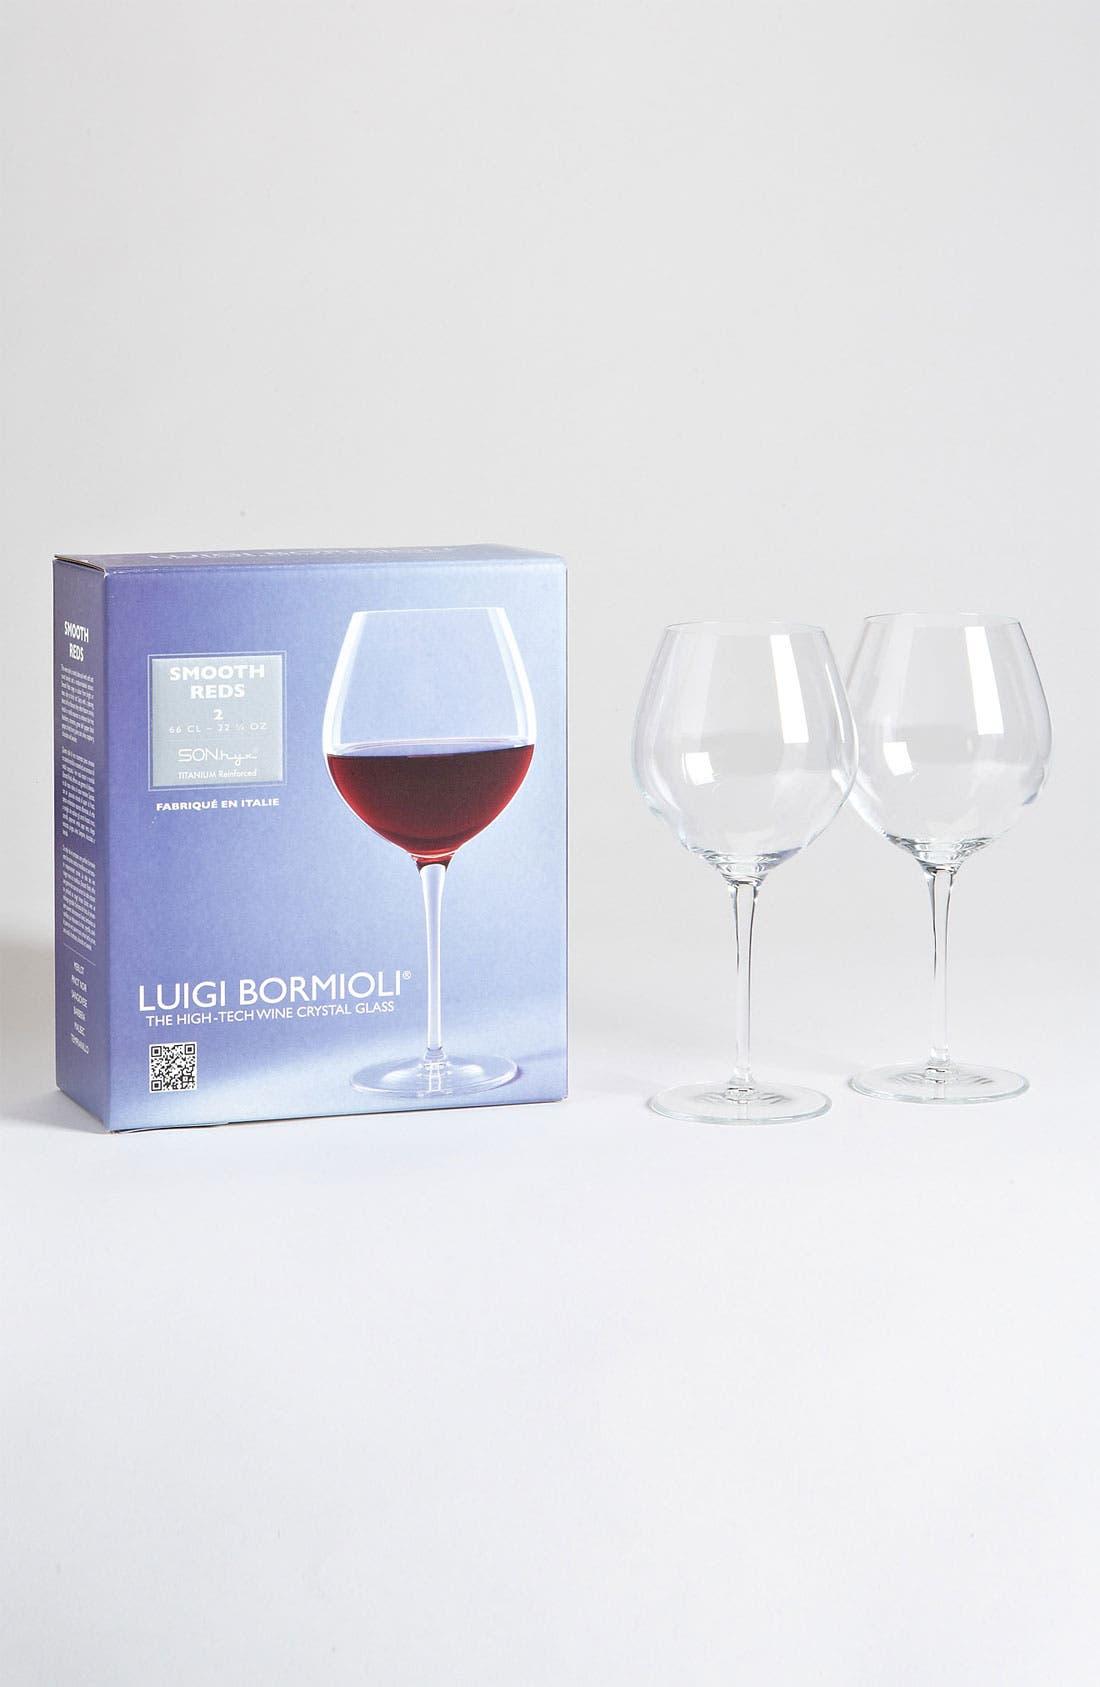 Main Image - Luigi Bormioli 'Wine Profiles Smooth Reds' Wine Glasses (Set of 2)